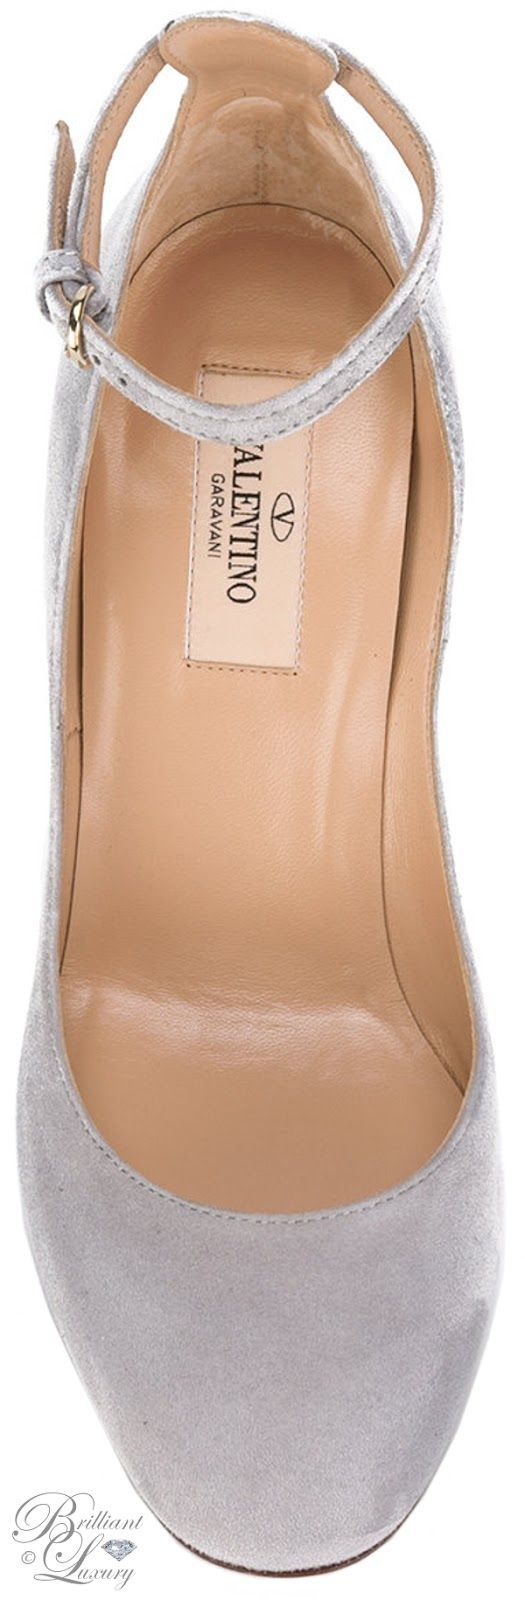 Brilliant Luxury by Emmy DE ♦ Valentino Garavani Tango Pumps